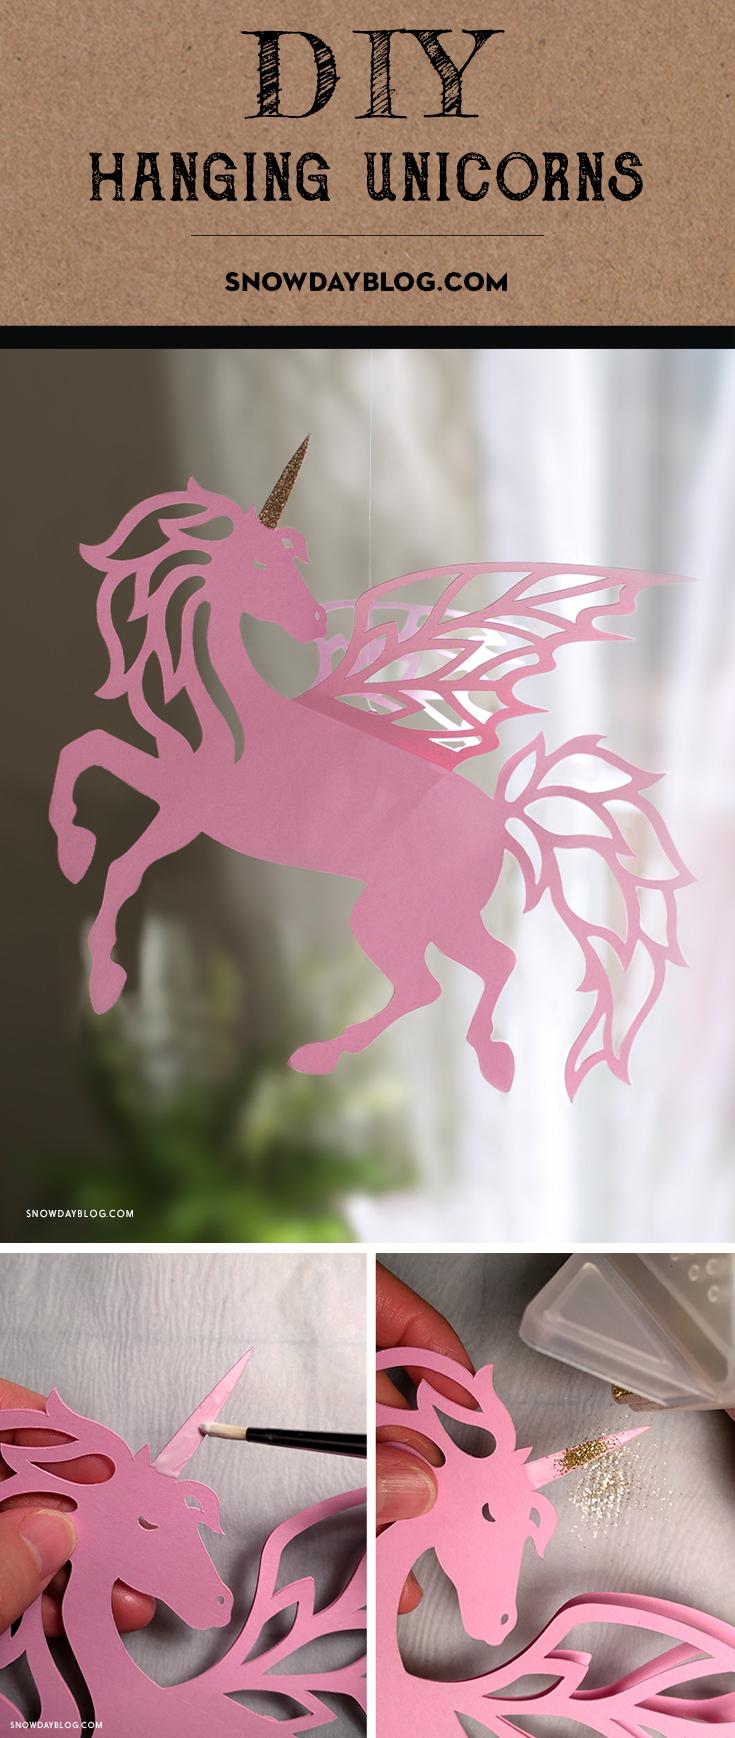 Hanging Unicorns Pinterest Pink